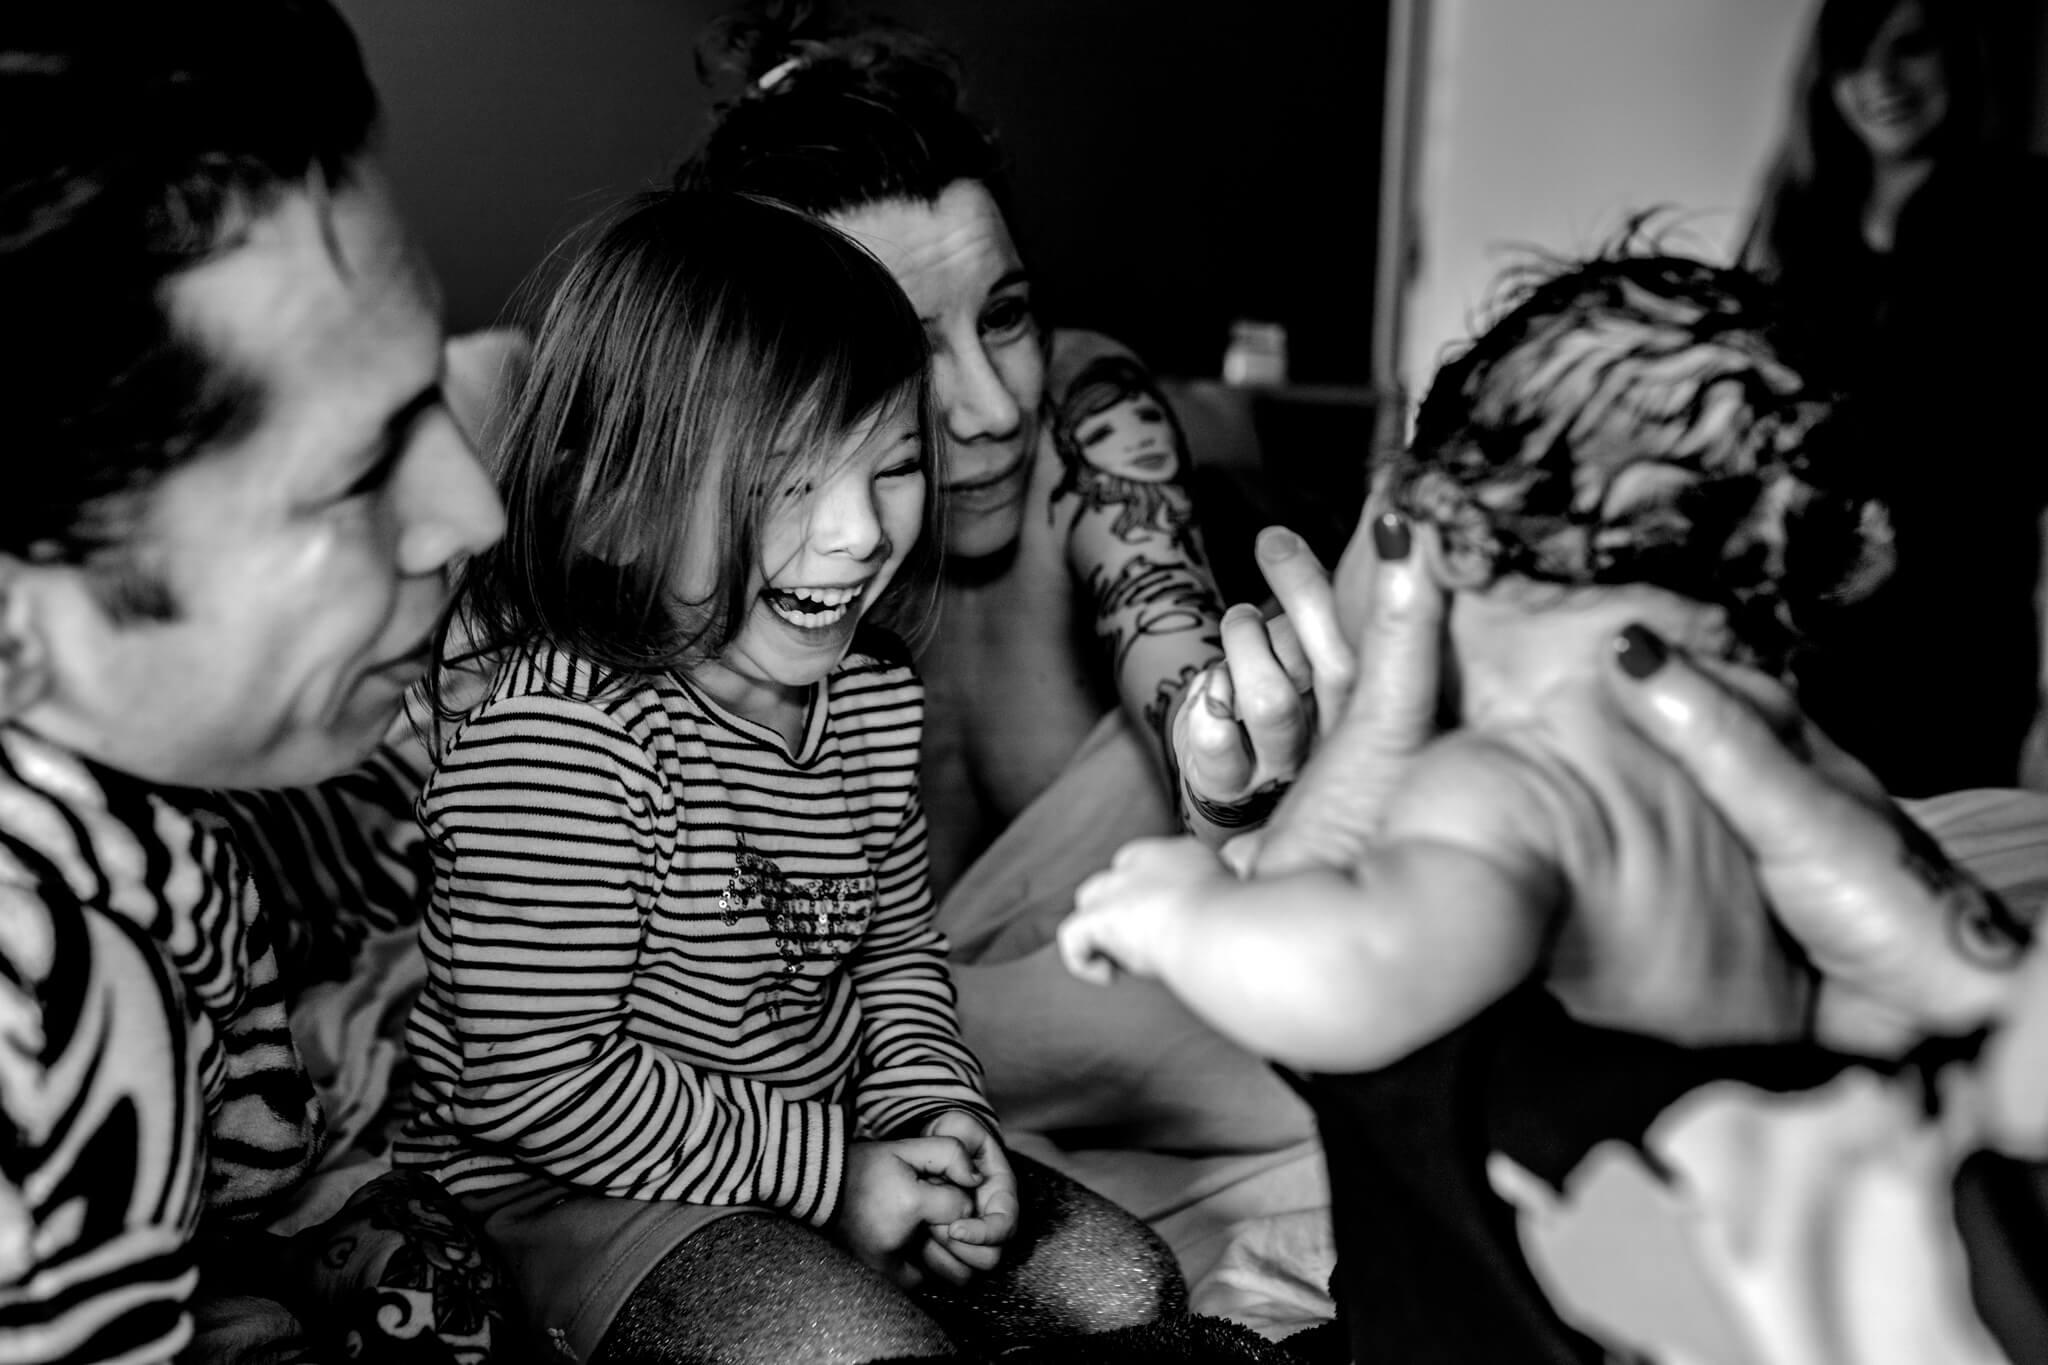 geboortefotografie Breda badbevalling thuisgeboorte Birth Day geboortefotografie Cindy Willems